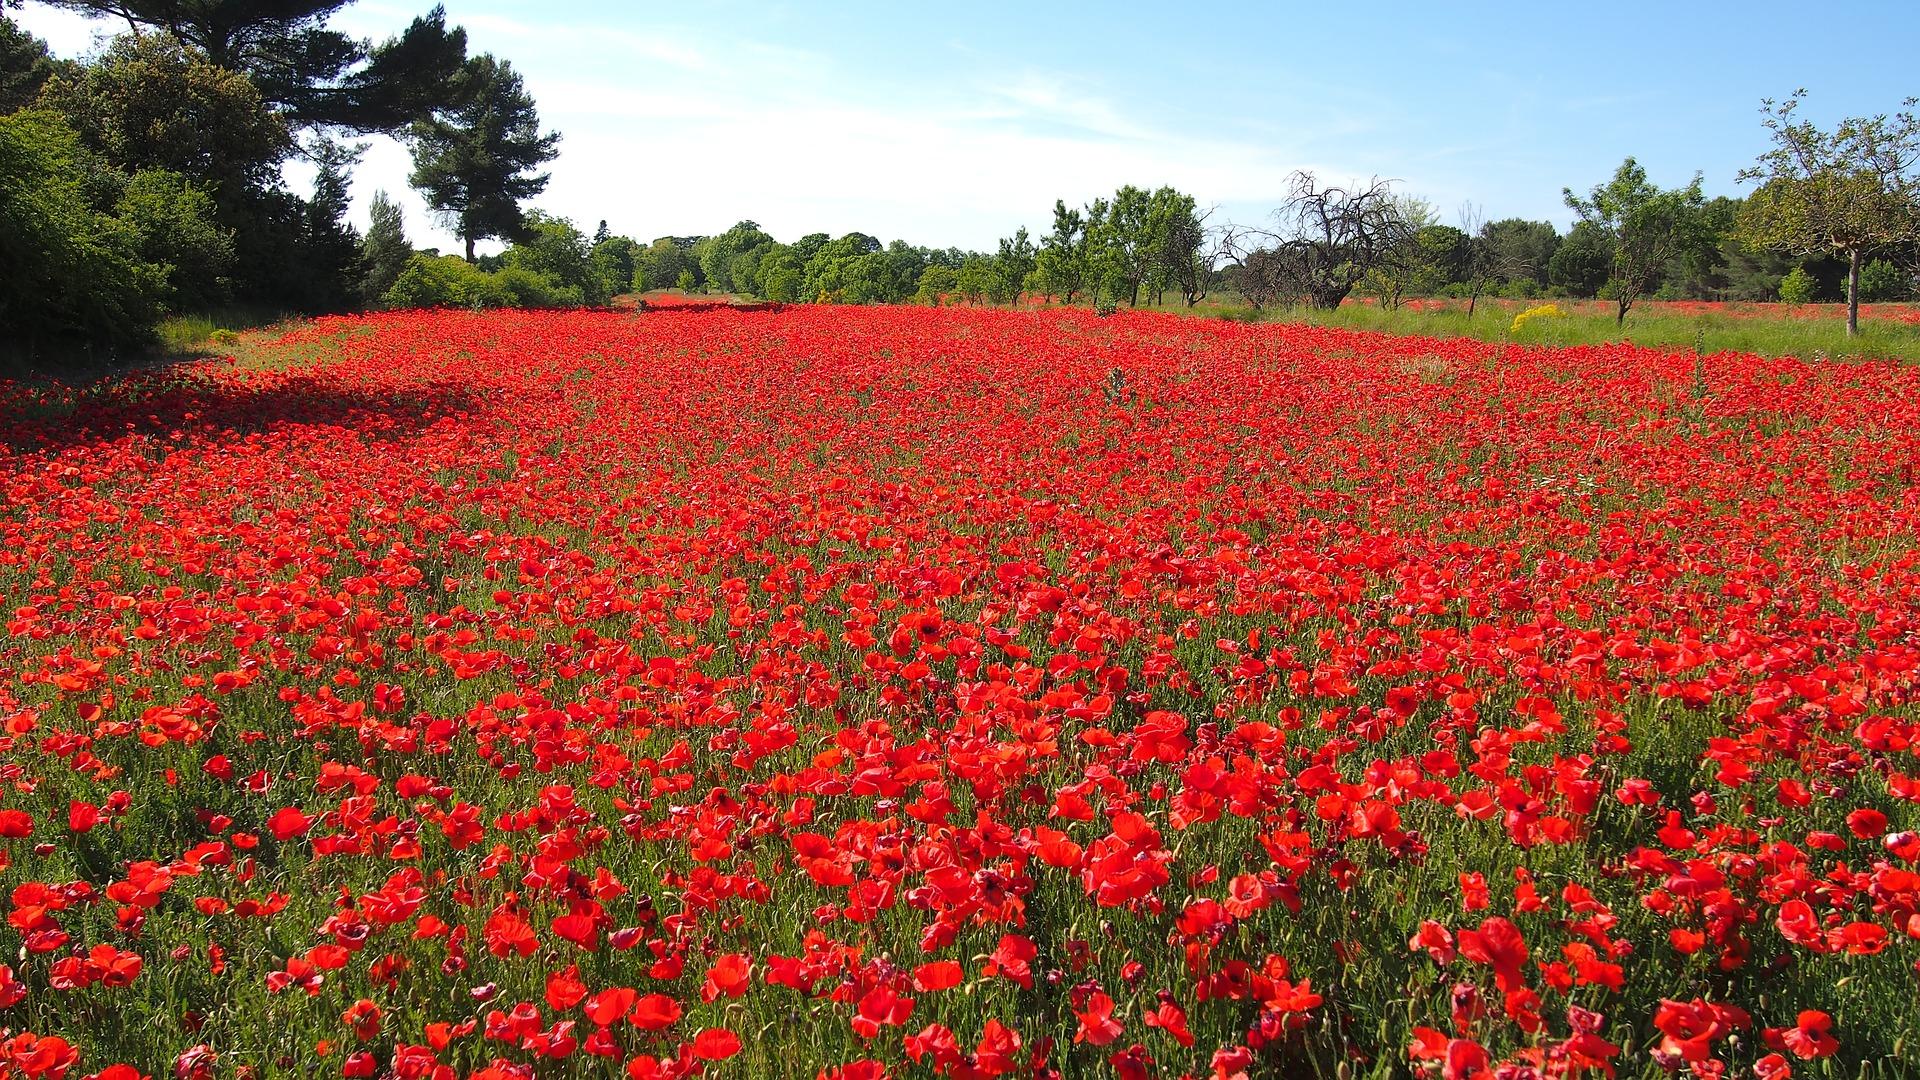 poppies-1762768_1920.jpg